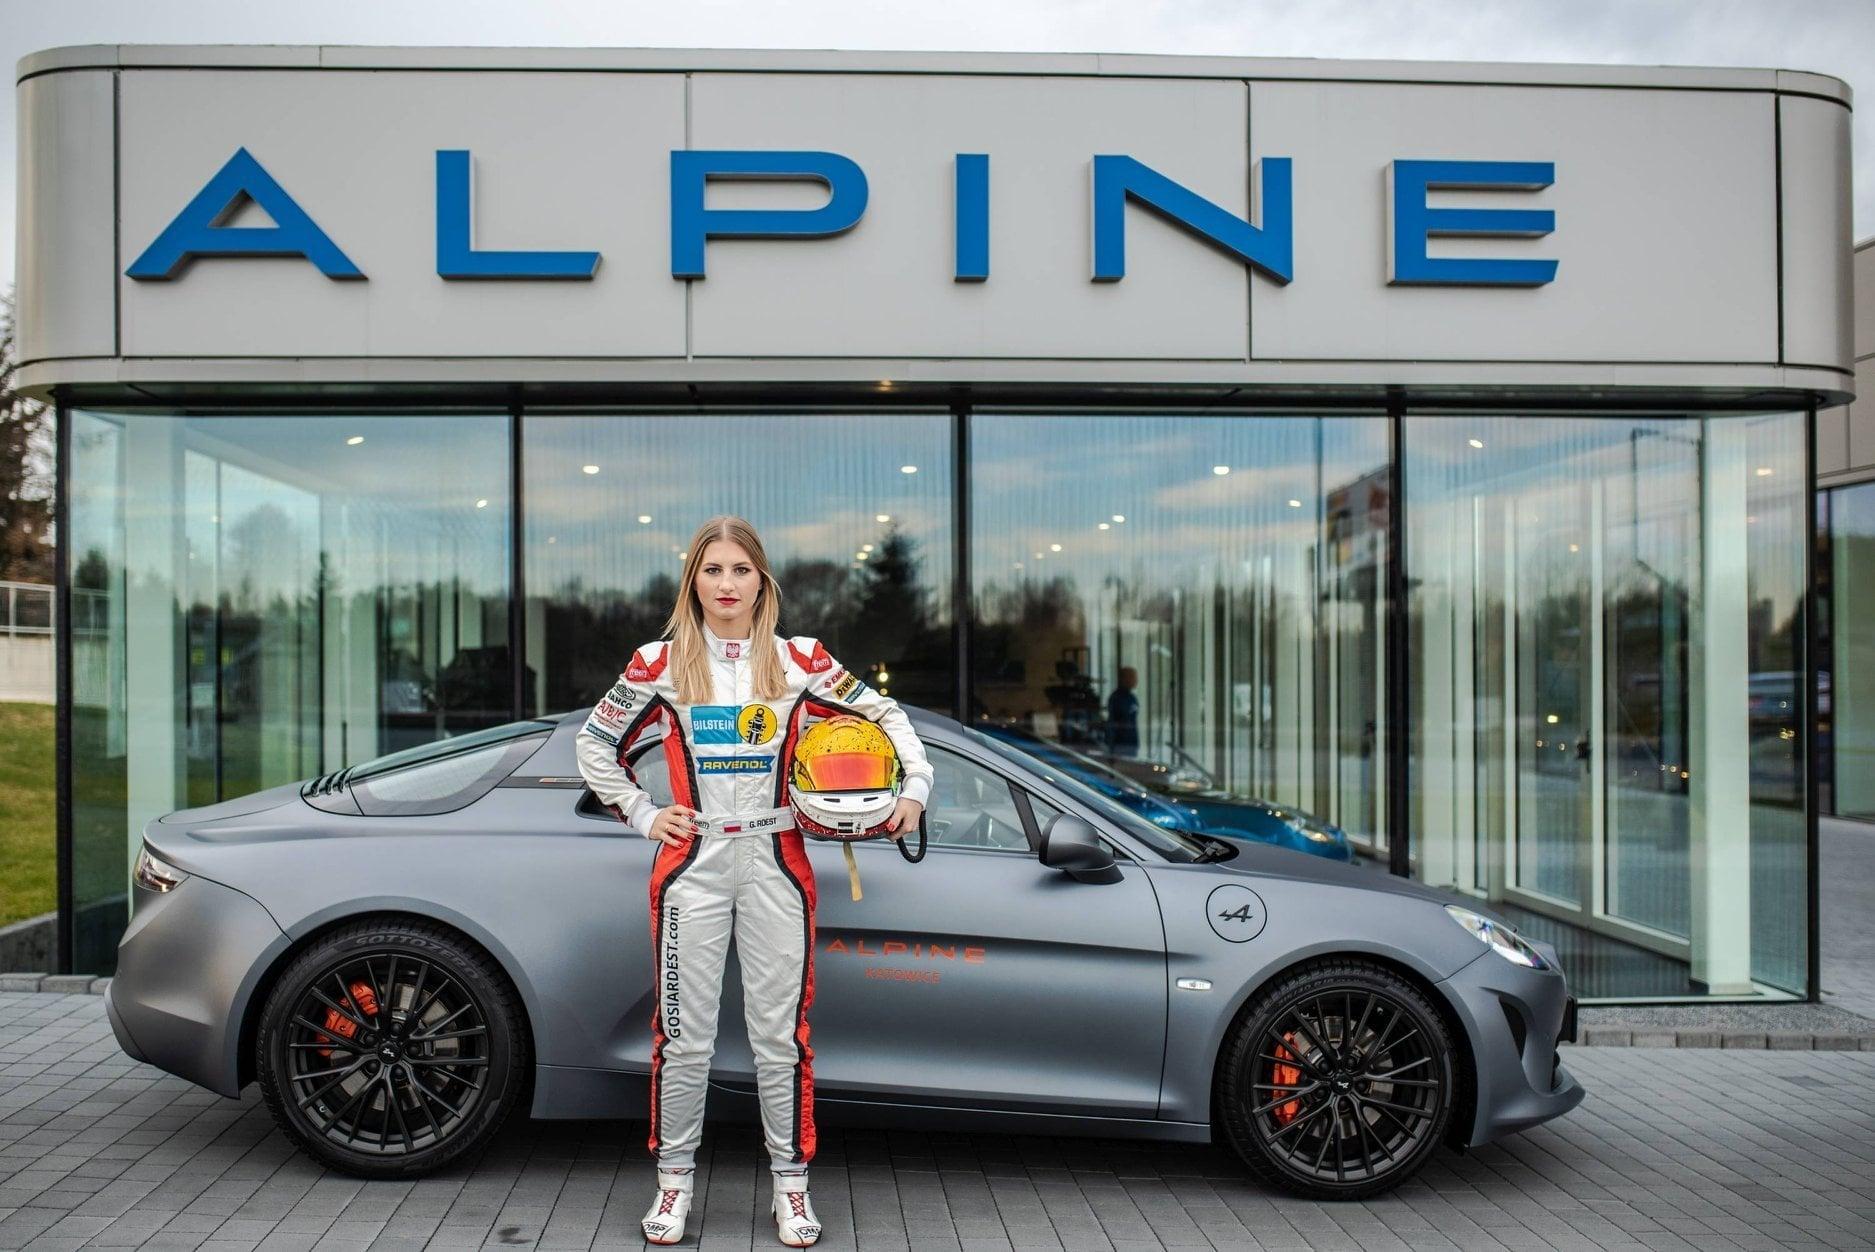 Alpine A110 Cup Elf Europa Gosia Rest Katowice 2020 (7)